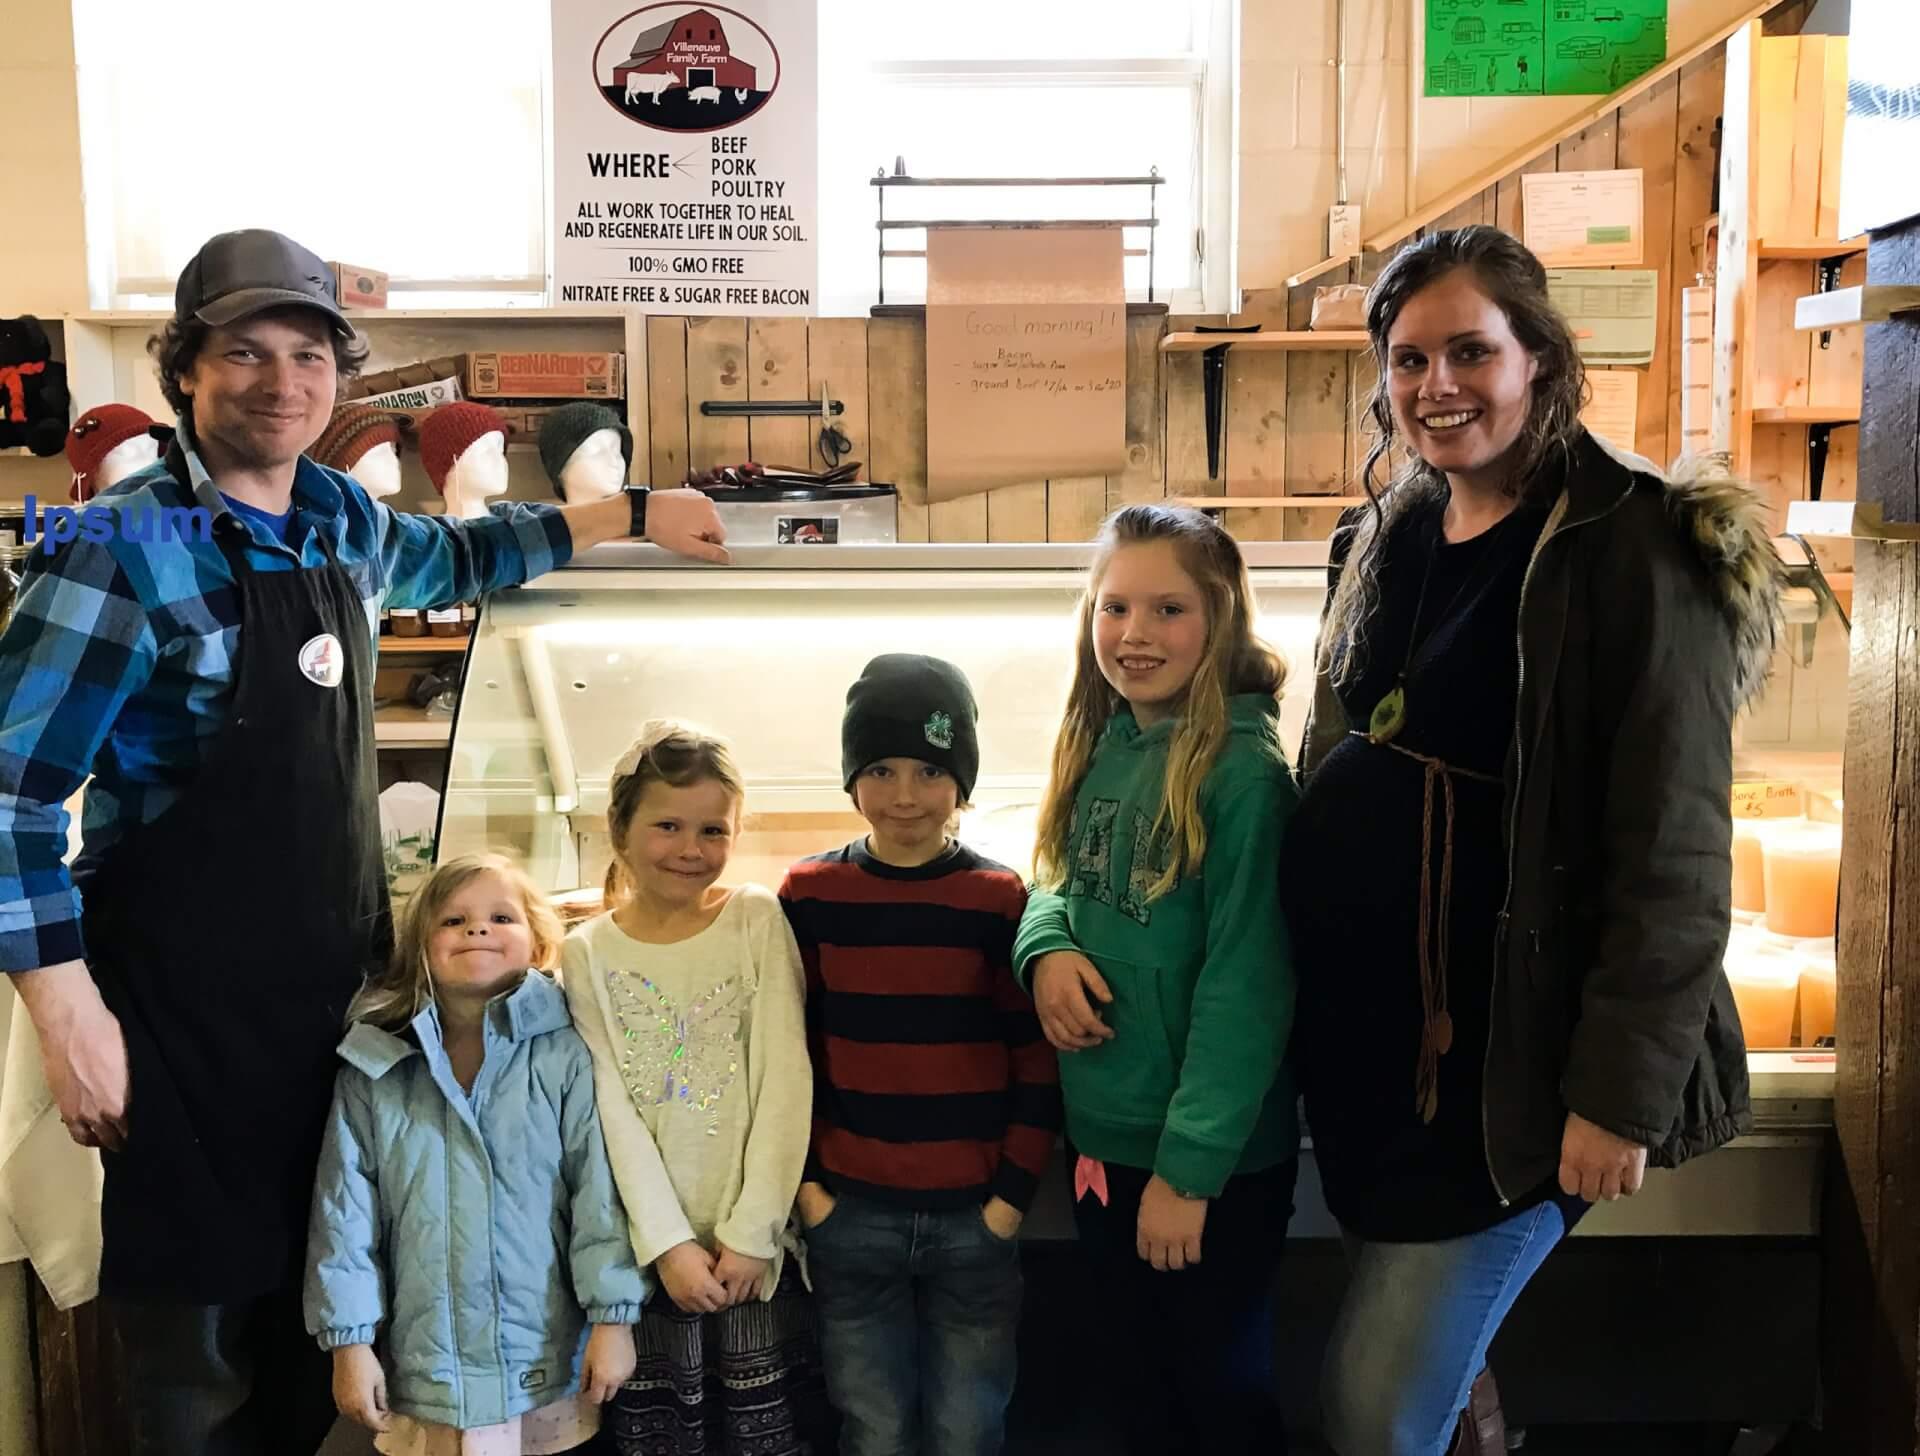 Villeneuve Family Farm